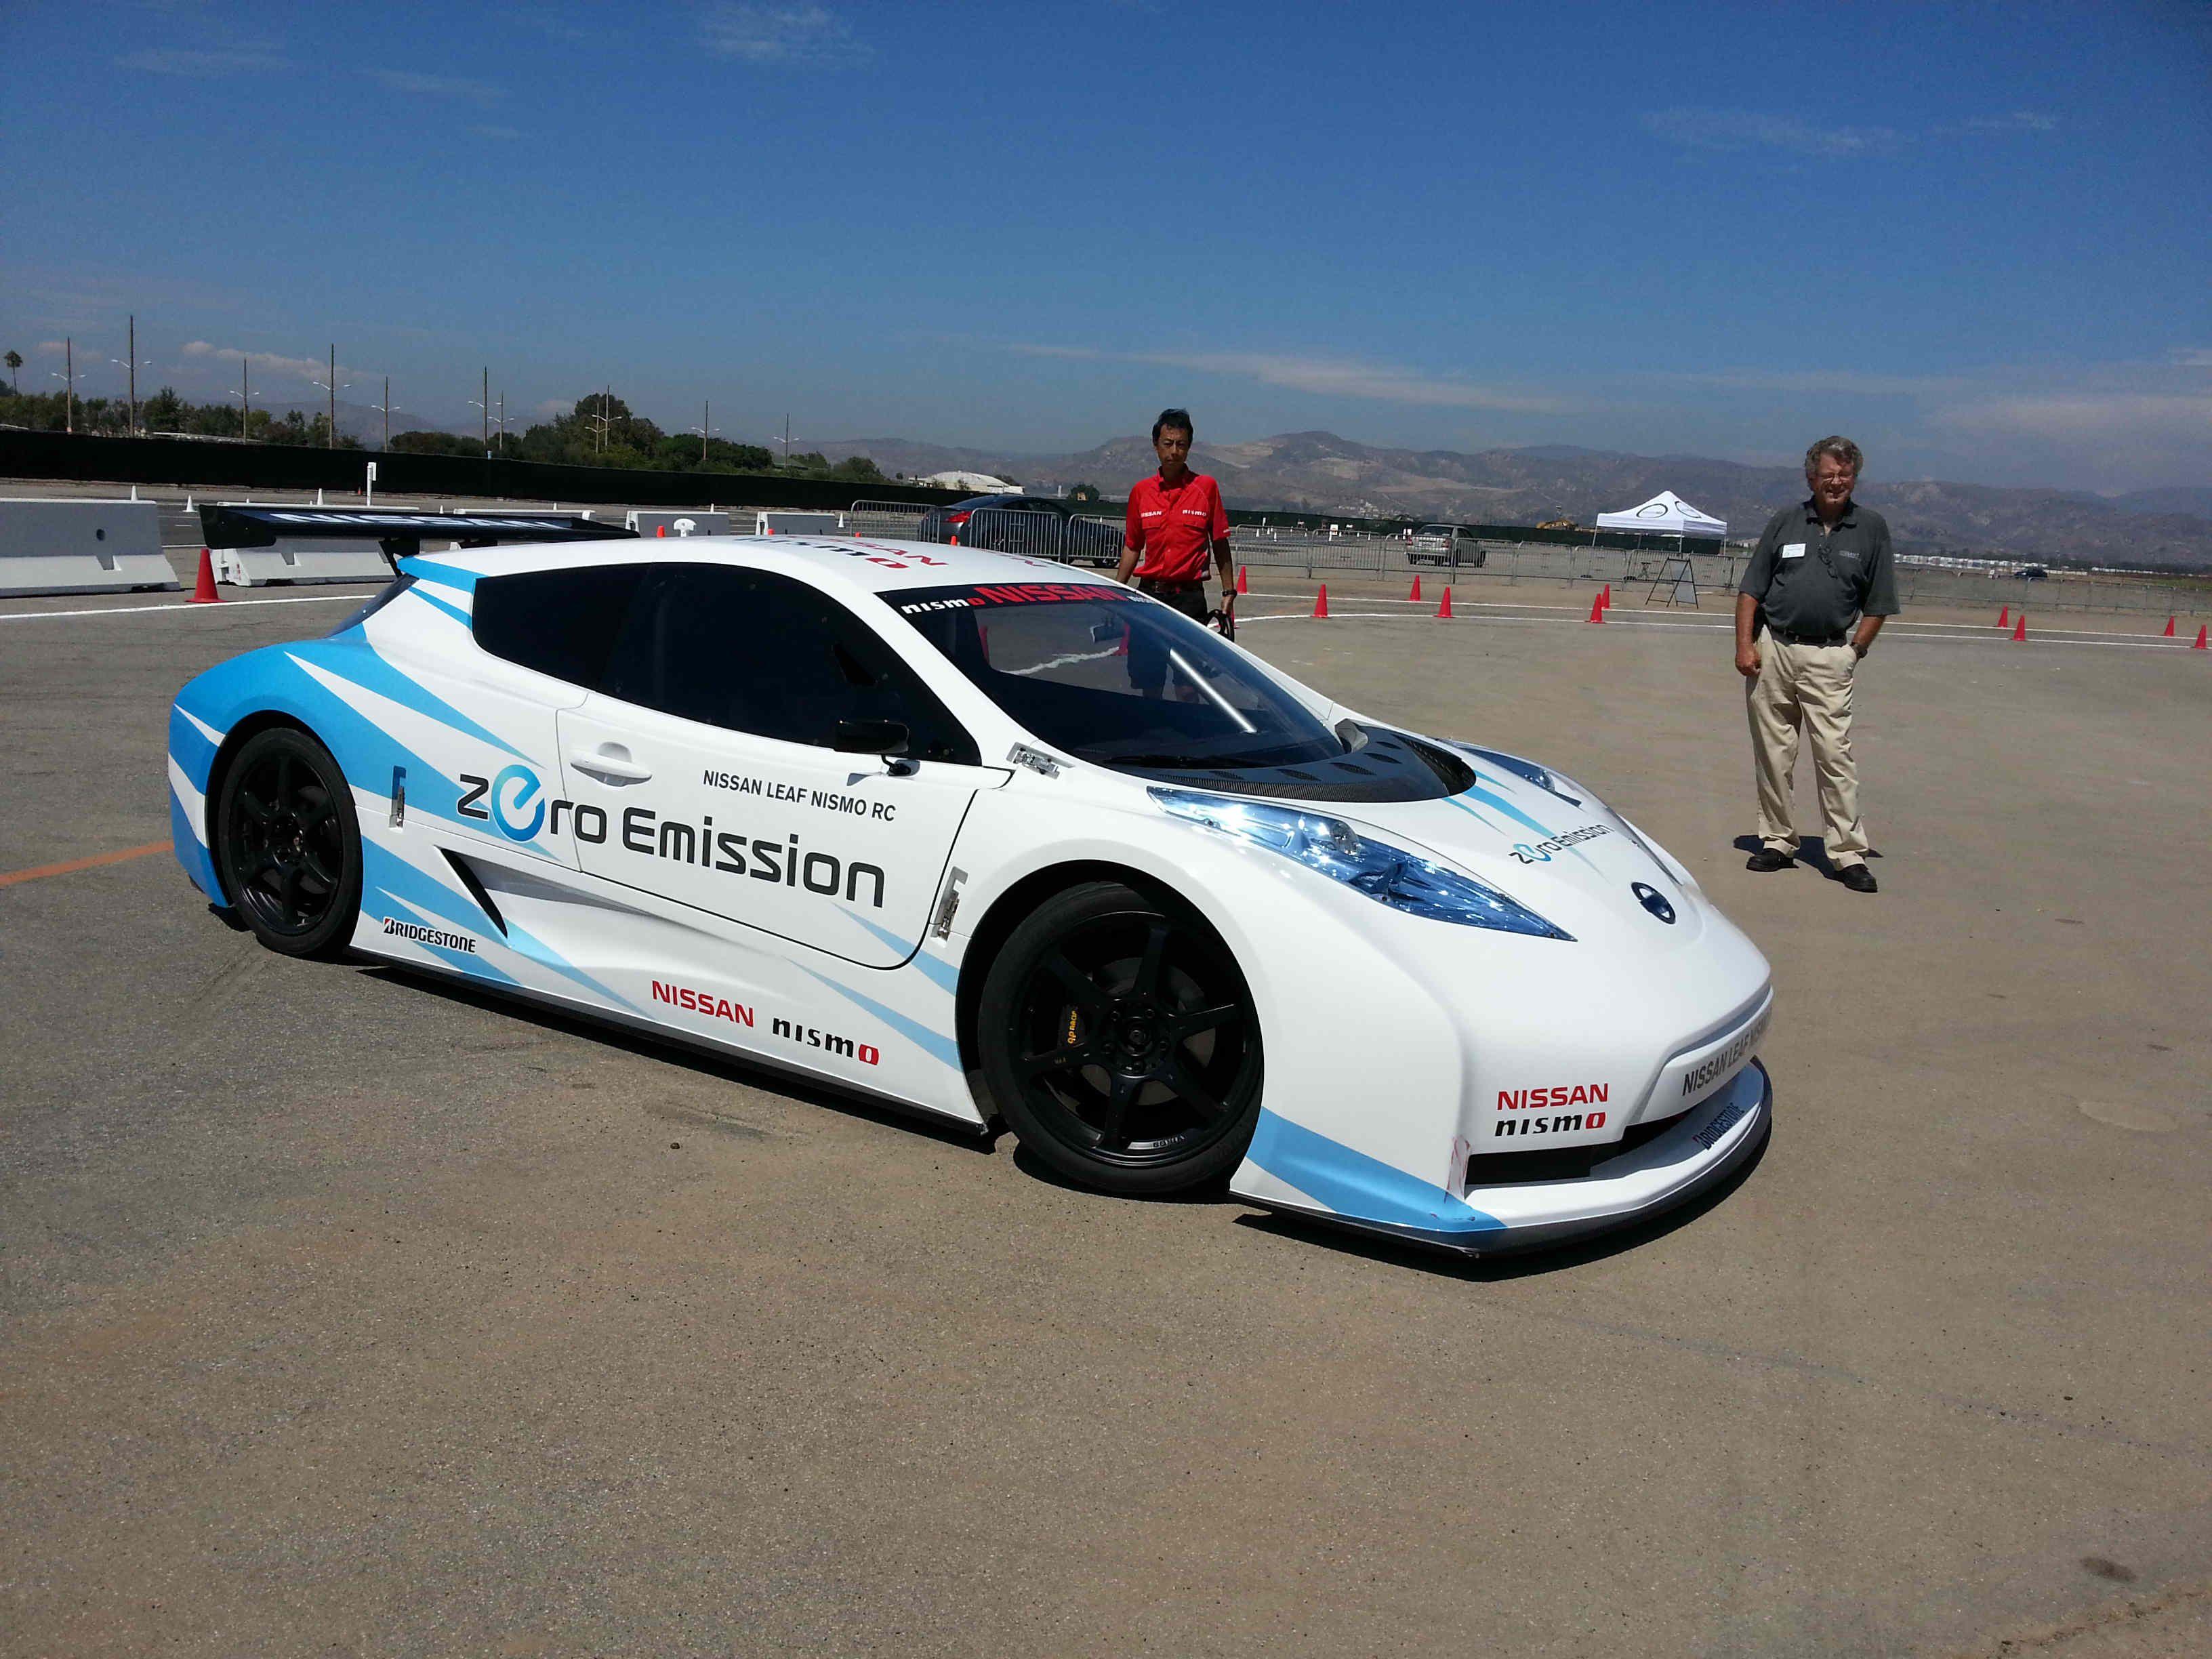 Imperio Nissan Garden Grove >> Nissan Leaf Nismo RC. | Sandy Sansing Nissan | Nissan leaf